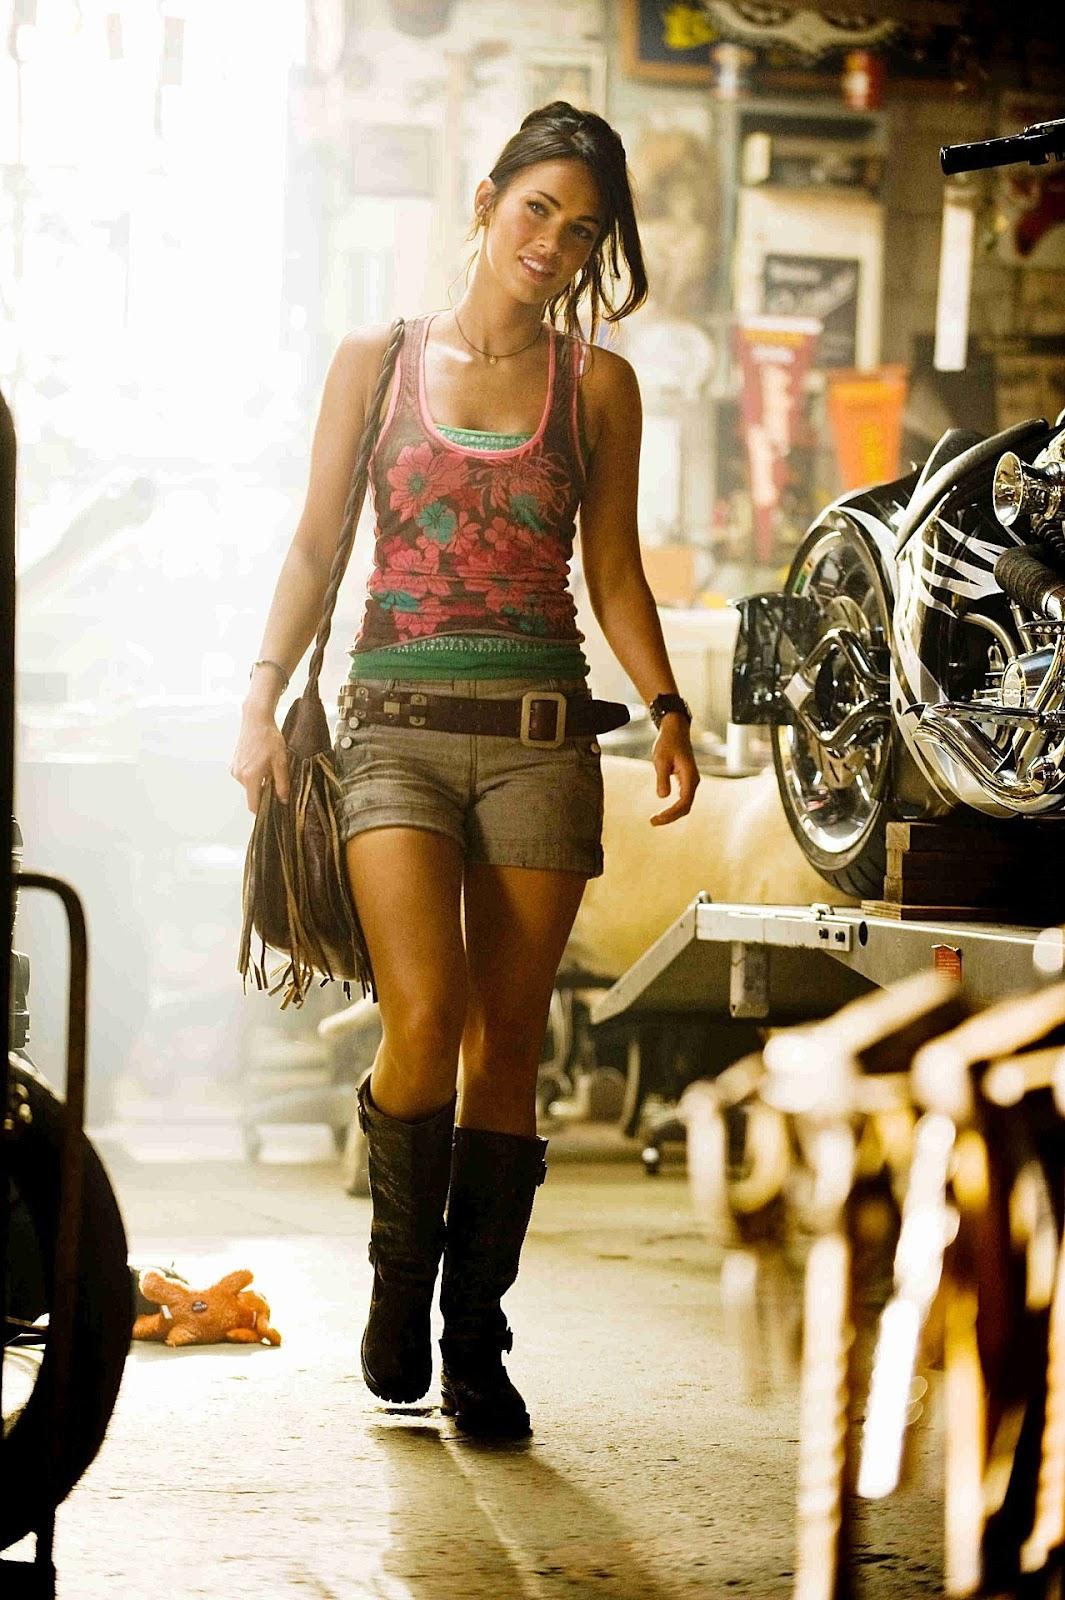 Celebrities, Movies and Games: Megan Fox - Transformers ... Megan Fox Movies